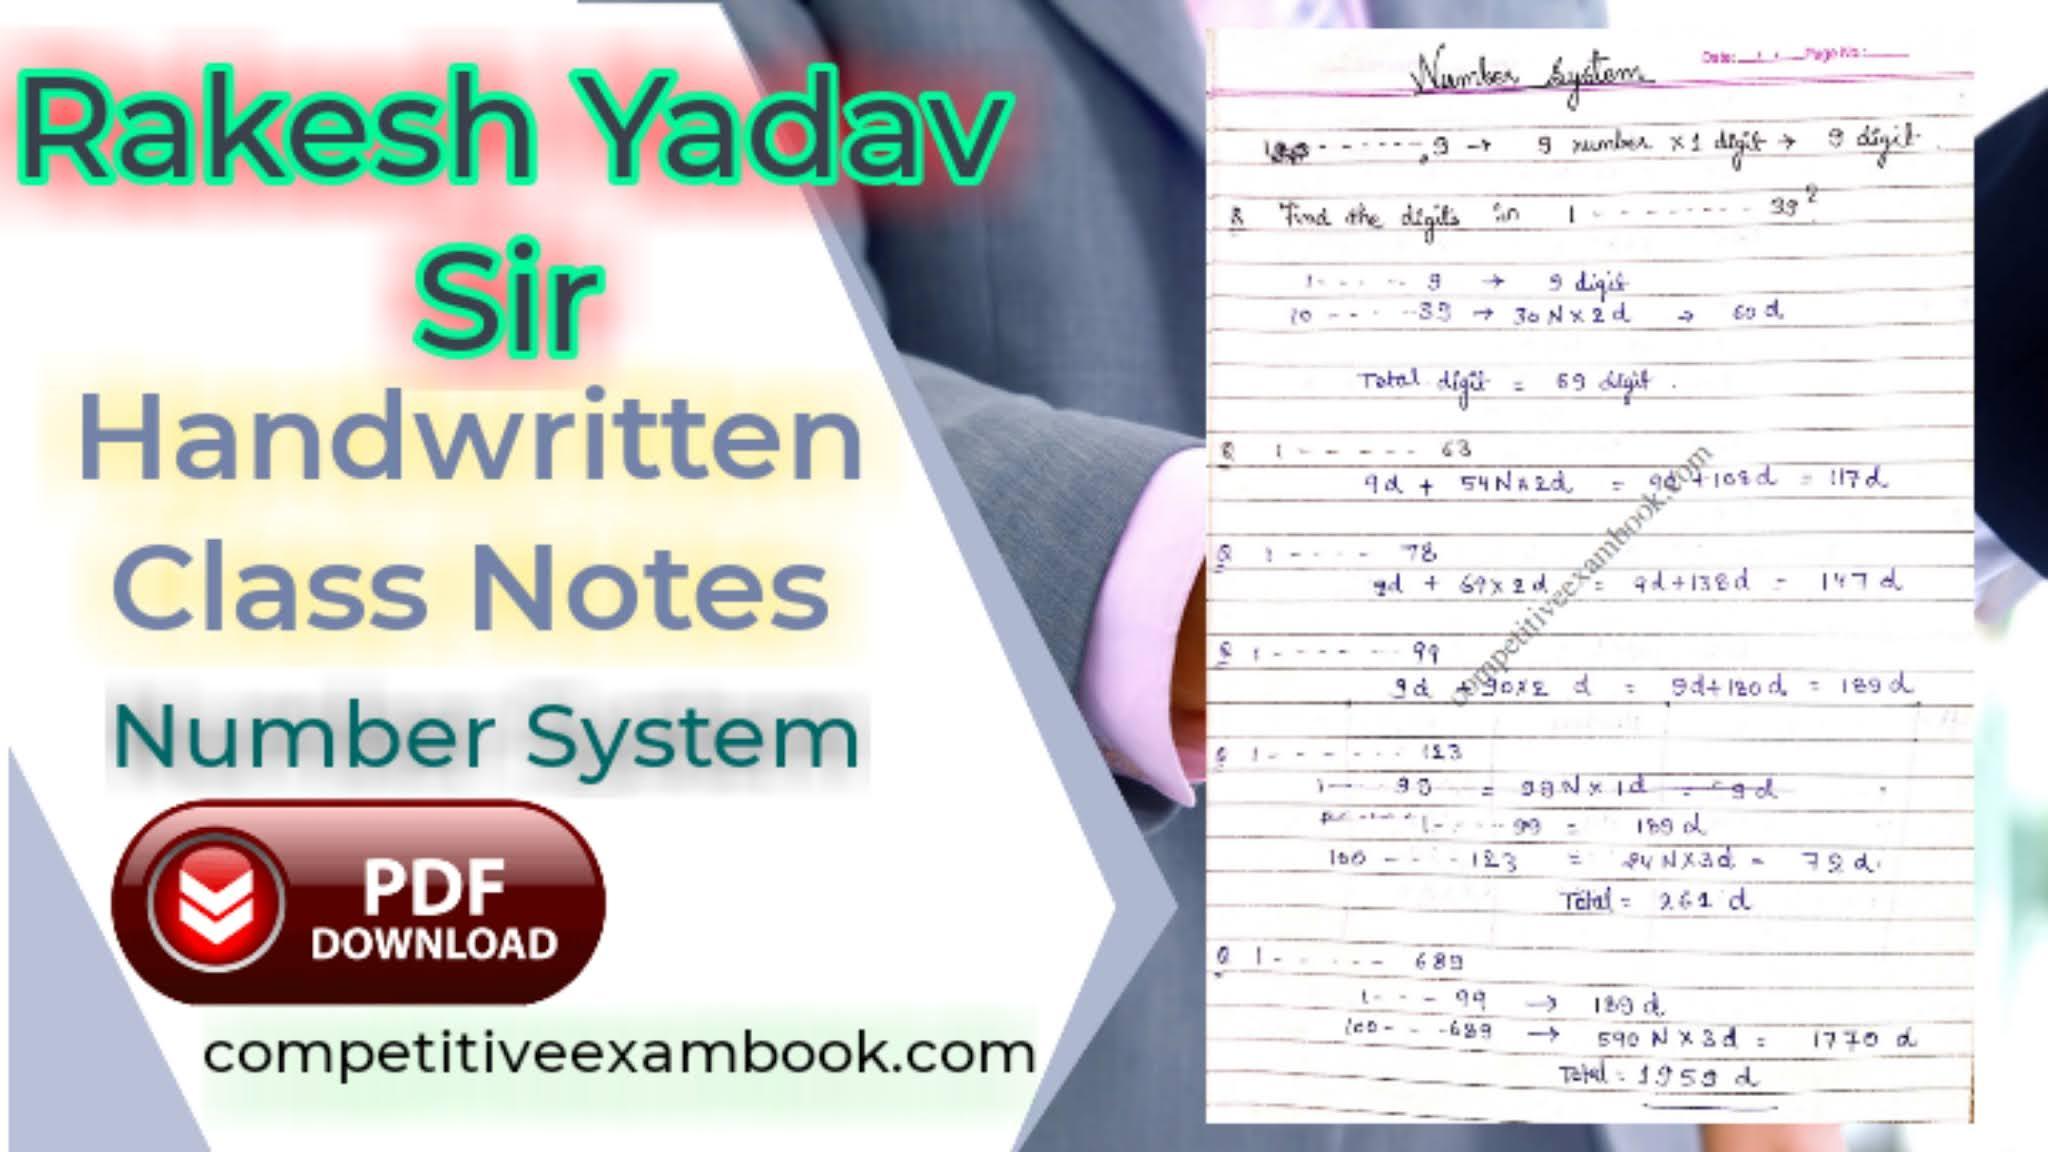 Rakesh Yadav Mathematics Class Notes Questions - GrabNaukri.com